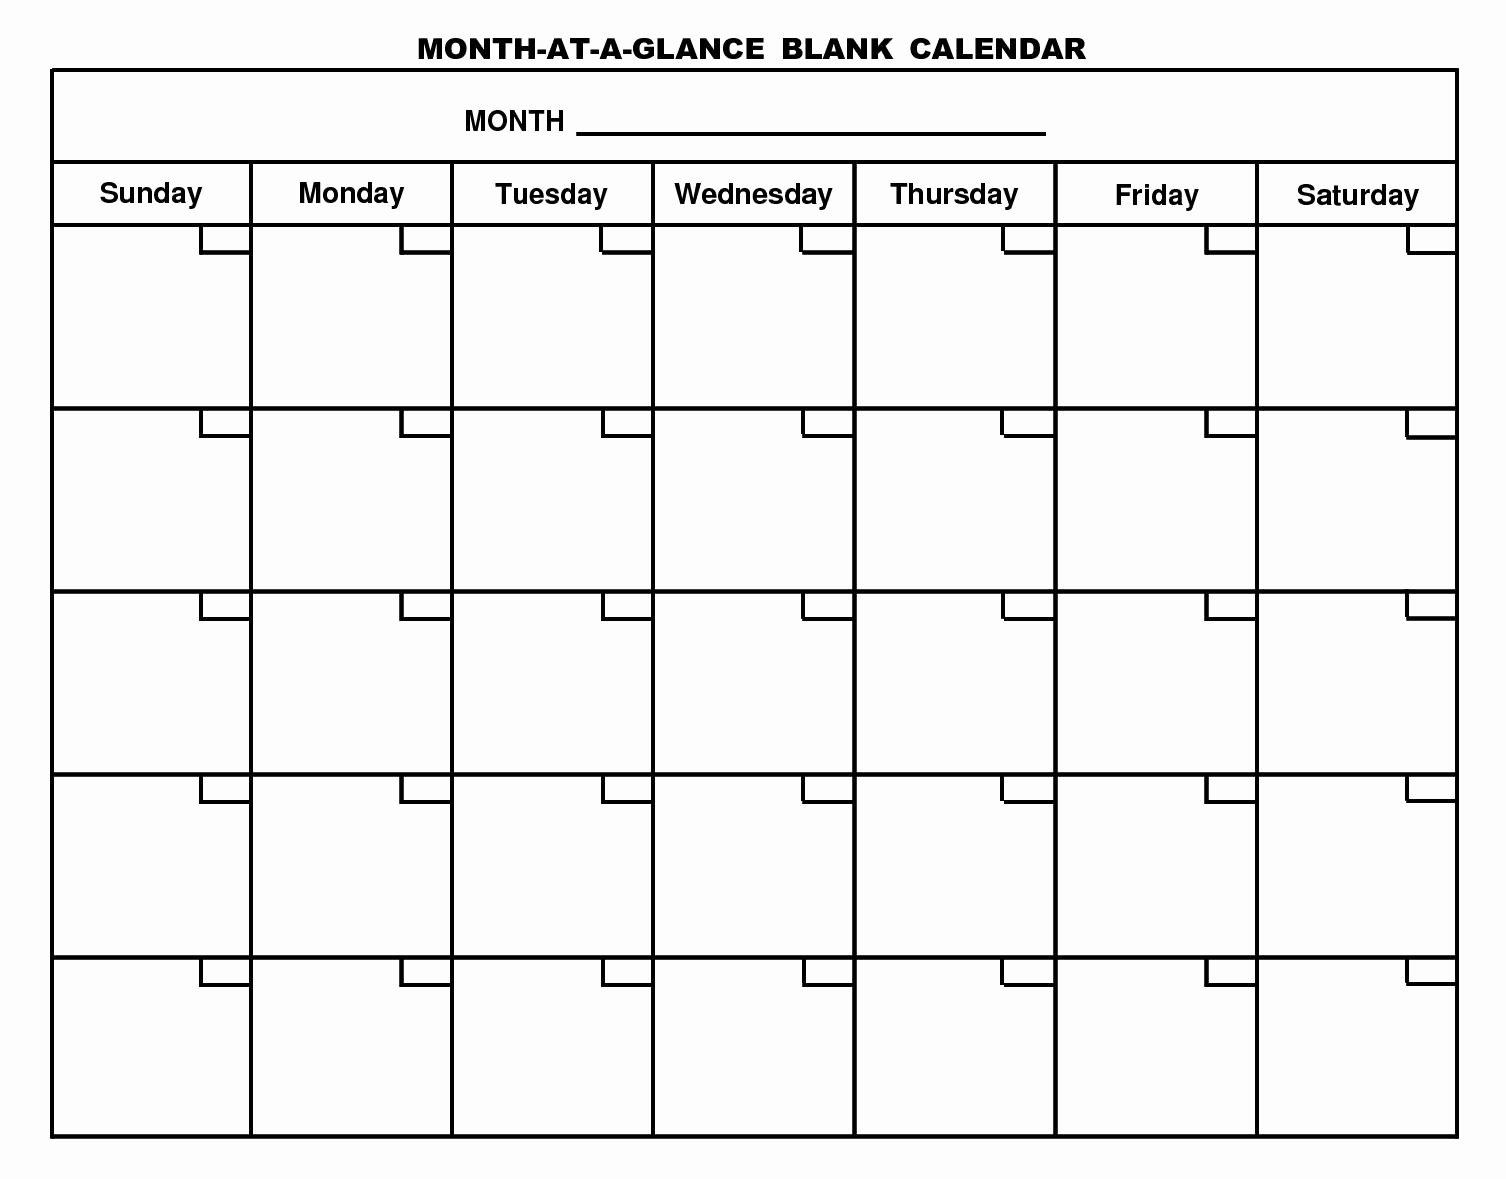 Free Printable Editable Calendar Fresh Free Printable Month at A Glance Blank Calendar 1506×1179